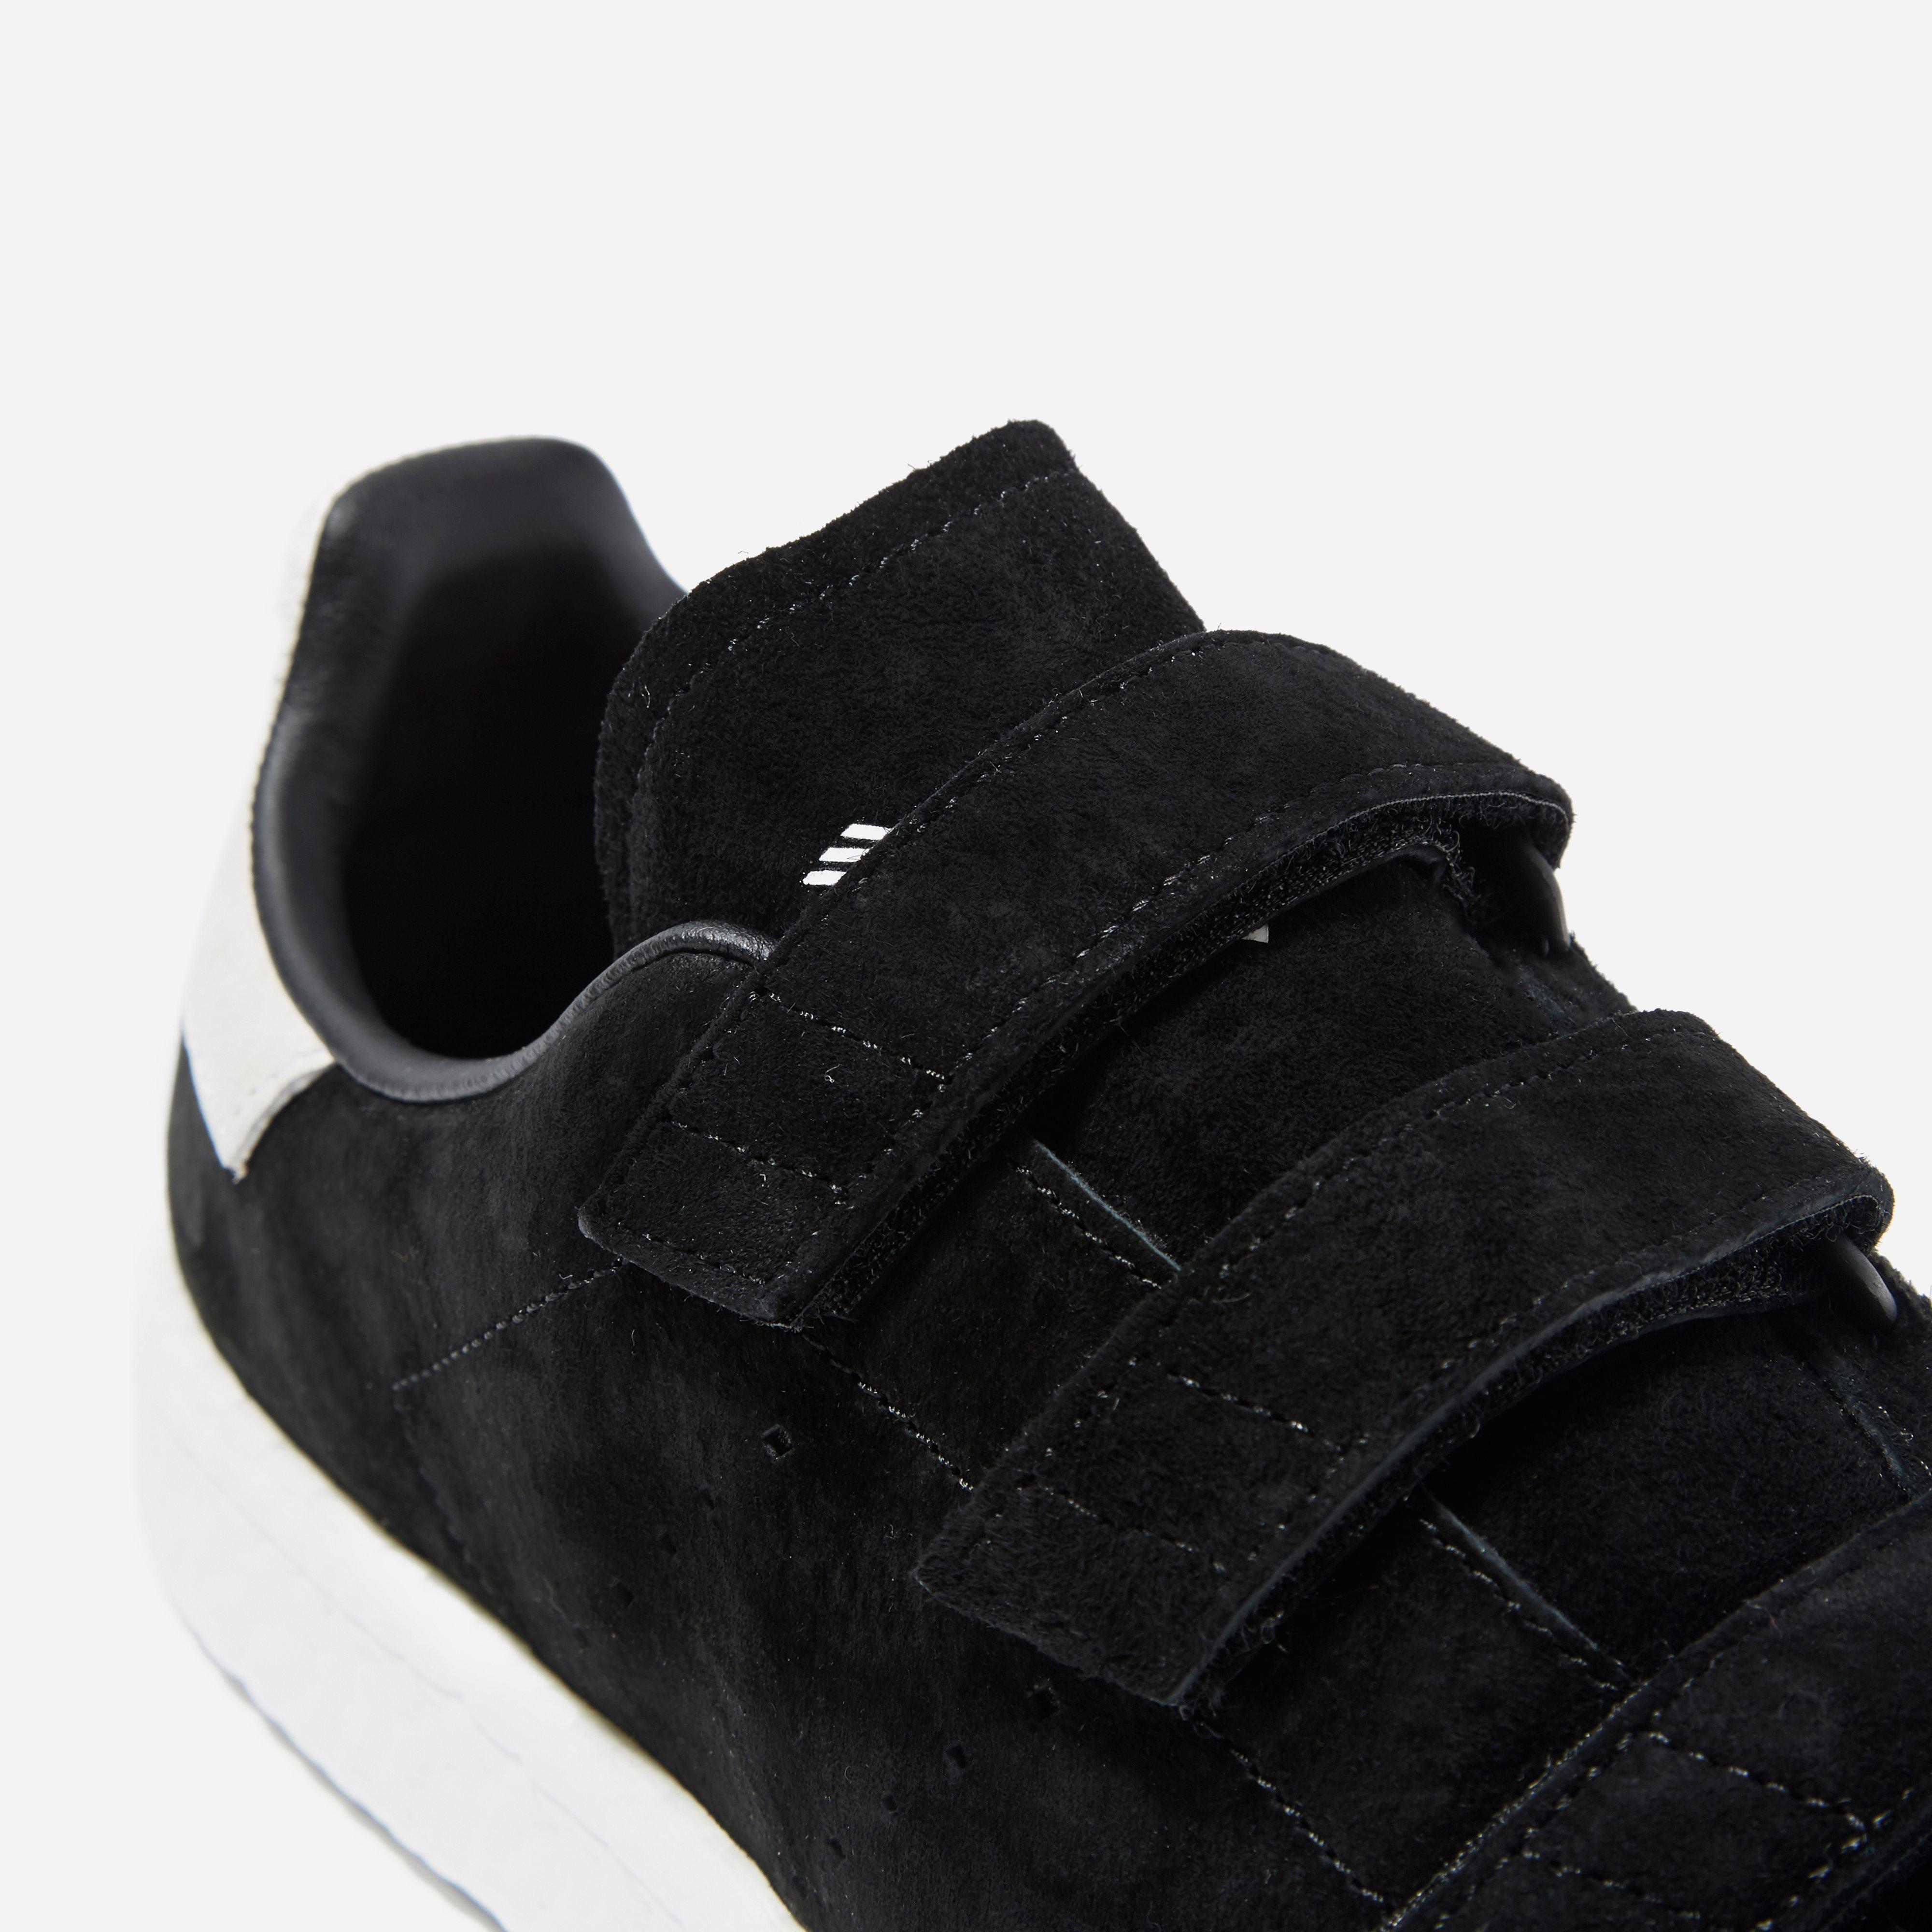 adidas Originals X White Mountaineering Stan Smith in Black for Men